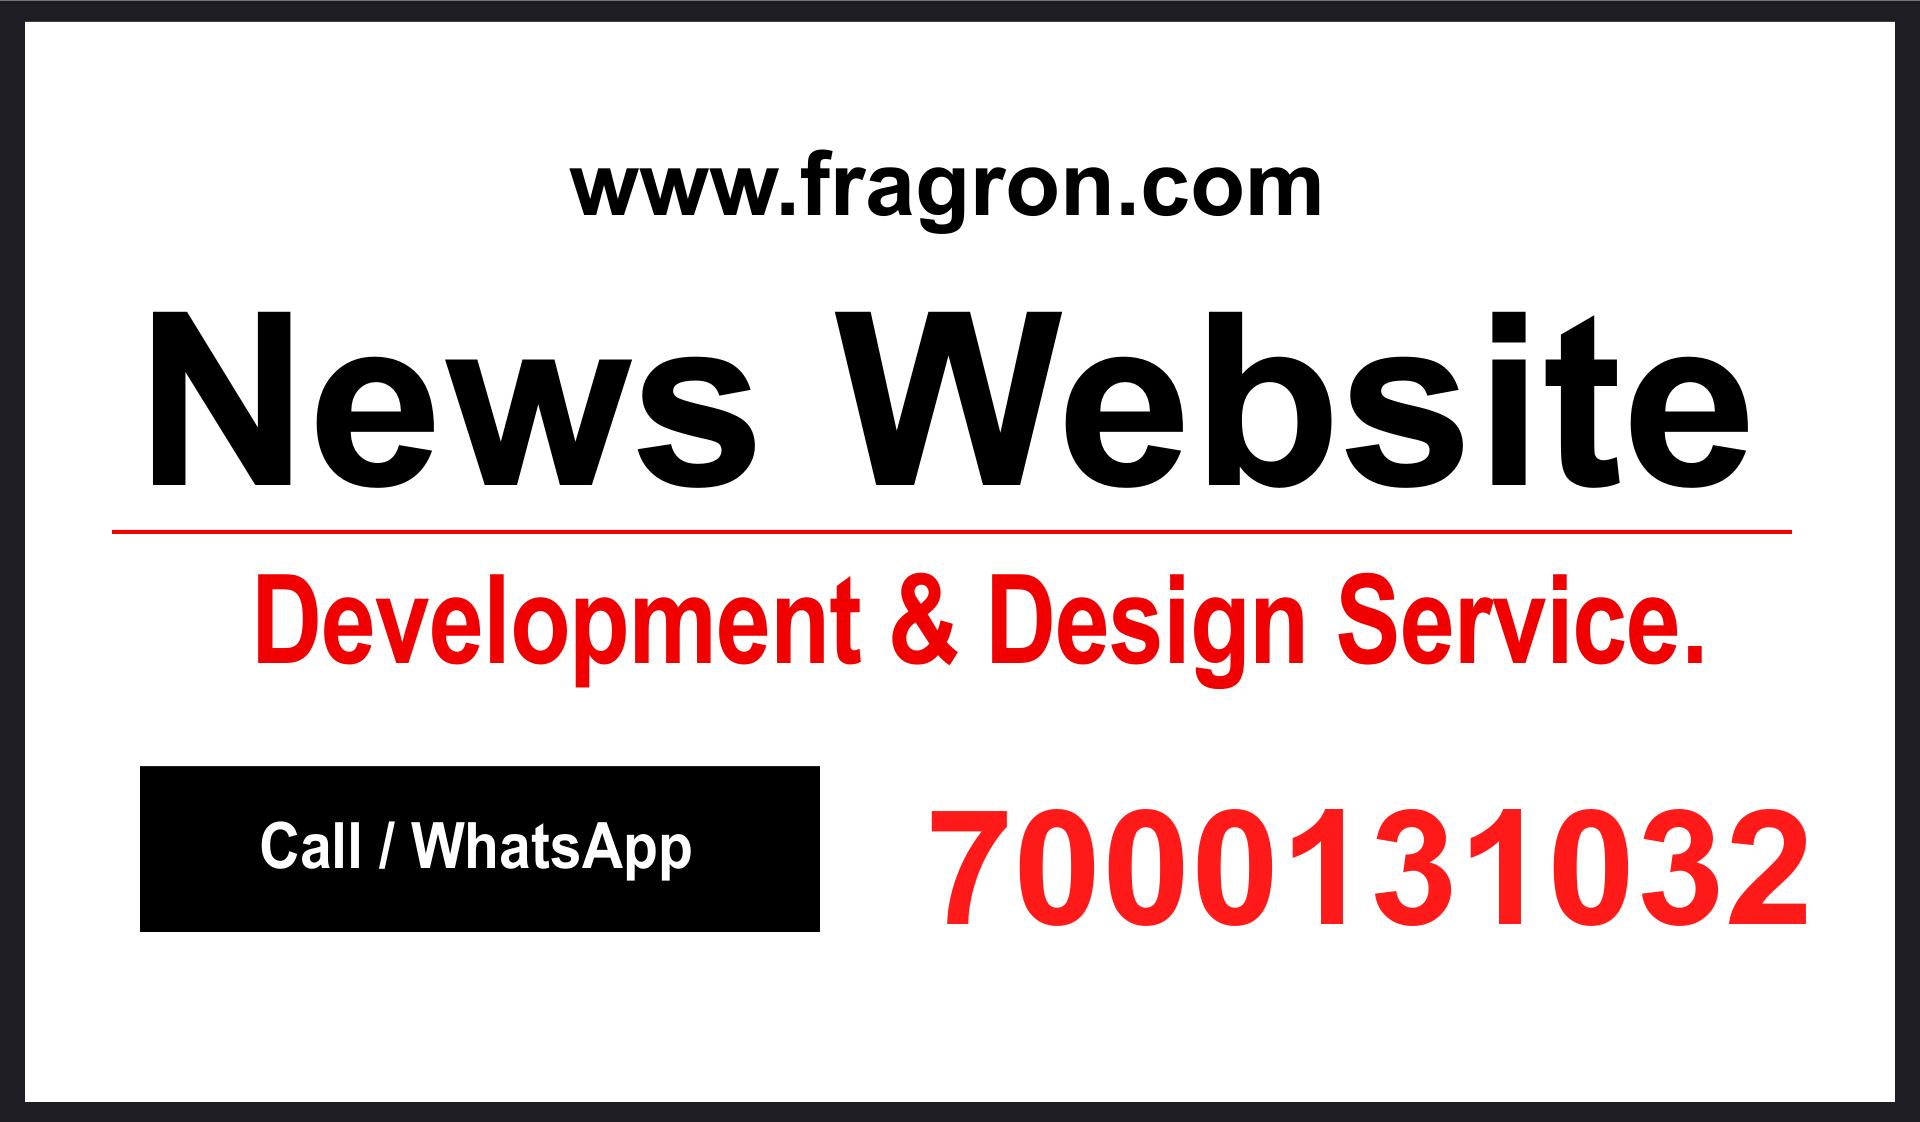 News Website Development and Design service